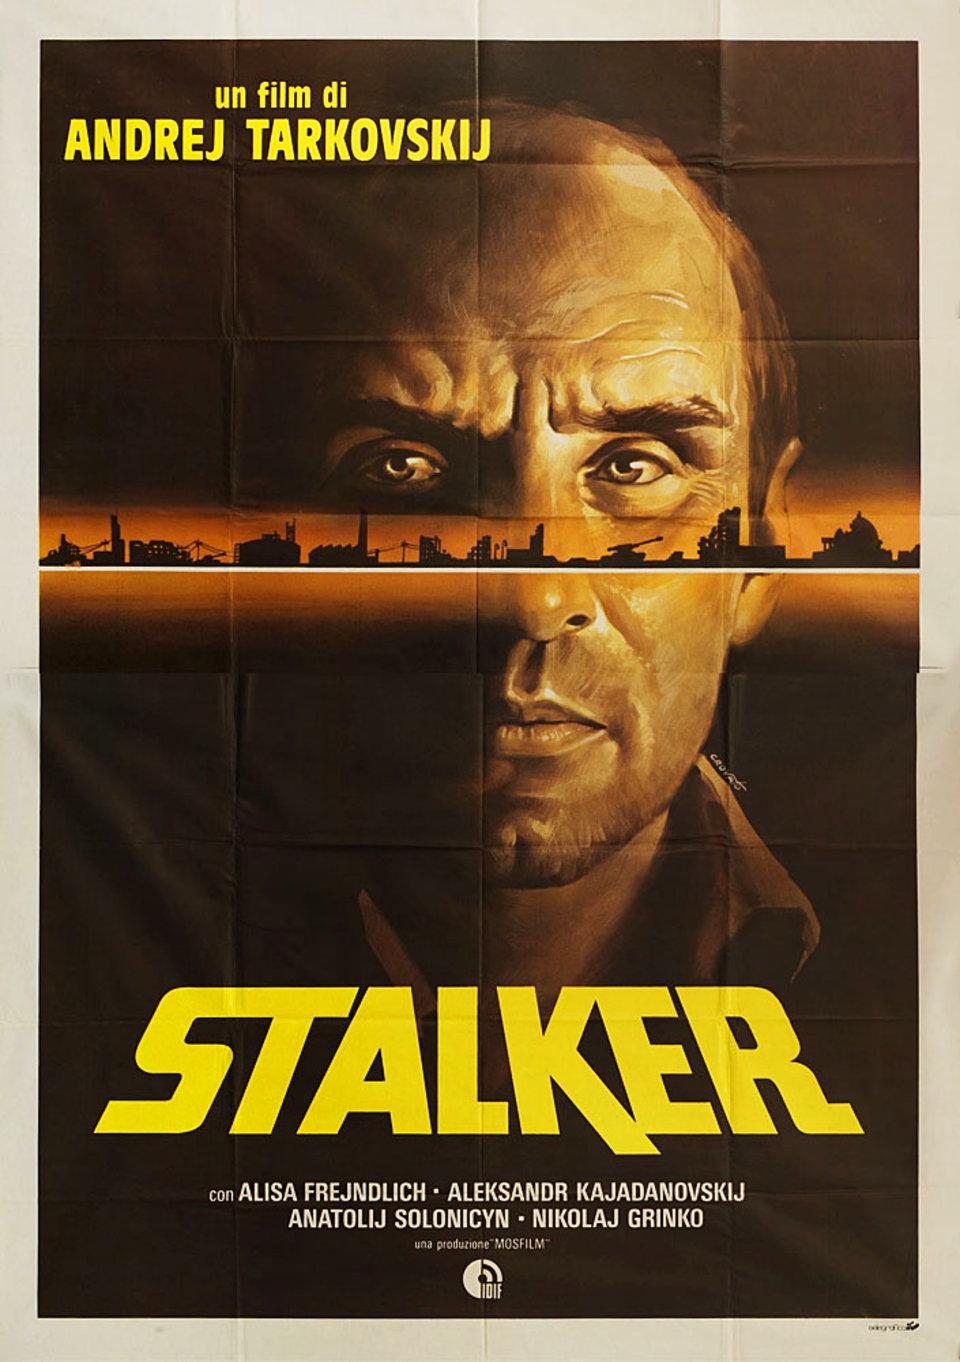 Stalker 1981 Italian Quattro Fogli Poster